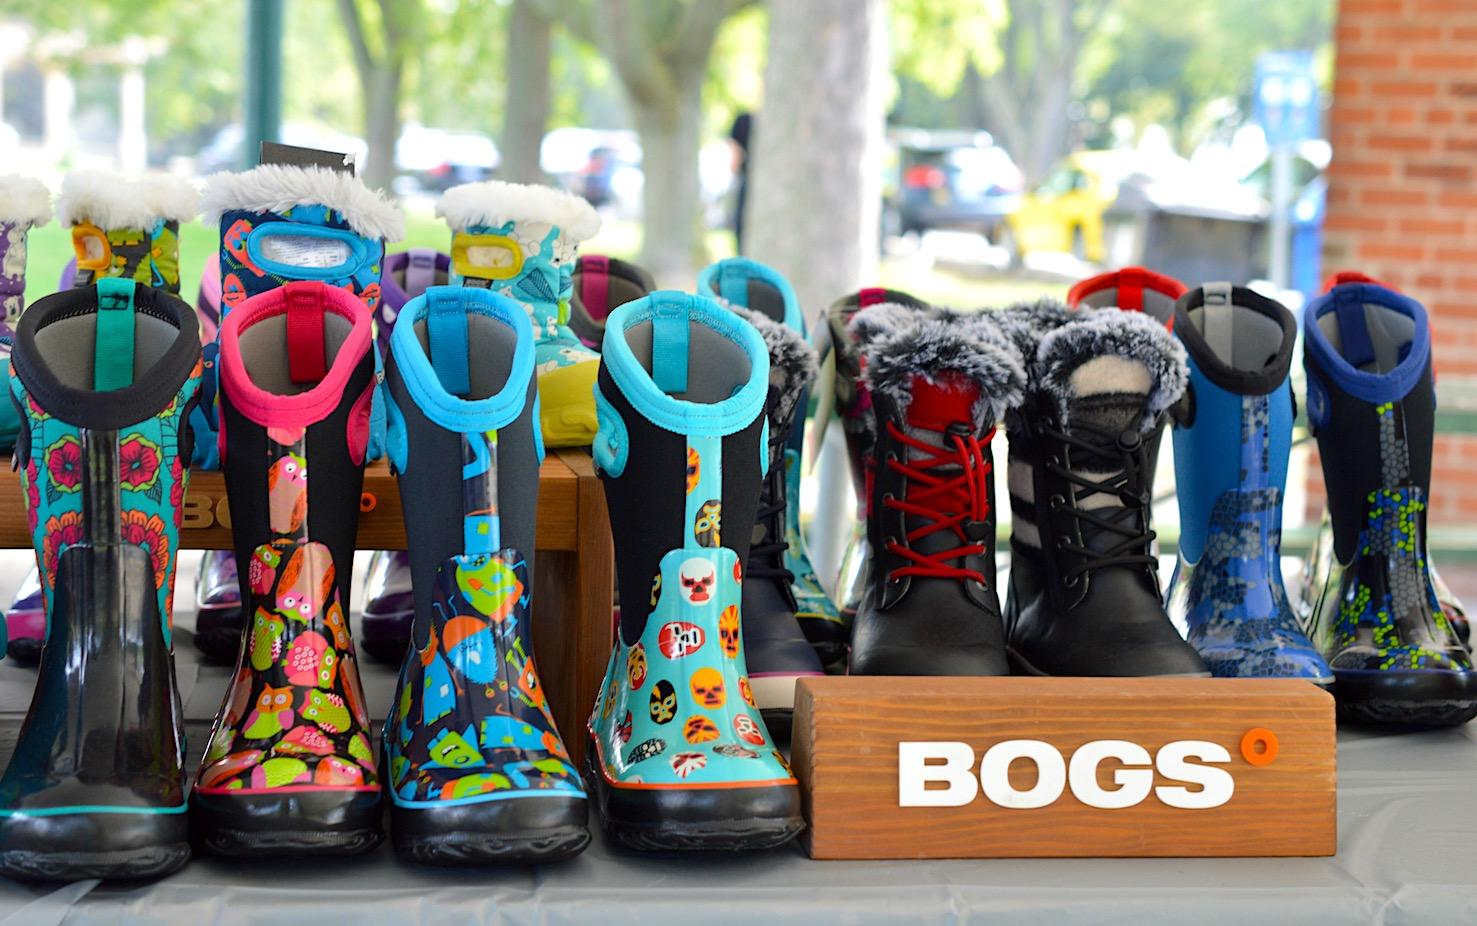 Bogs Children's Boots